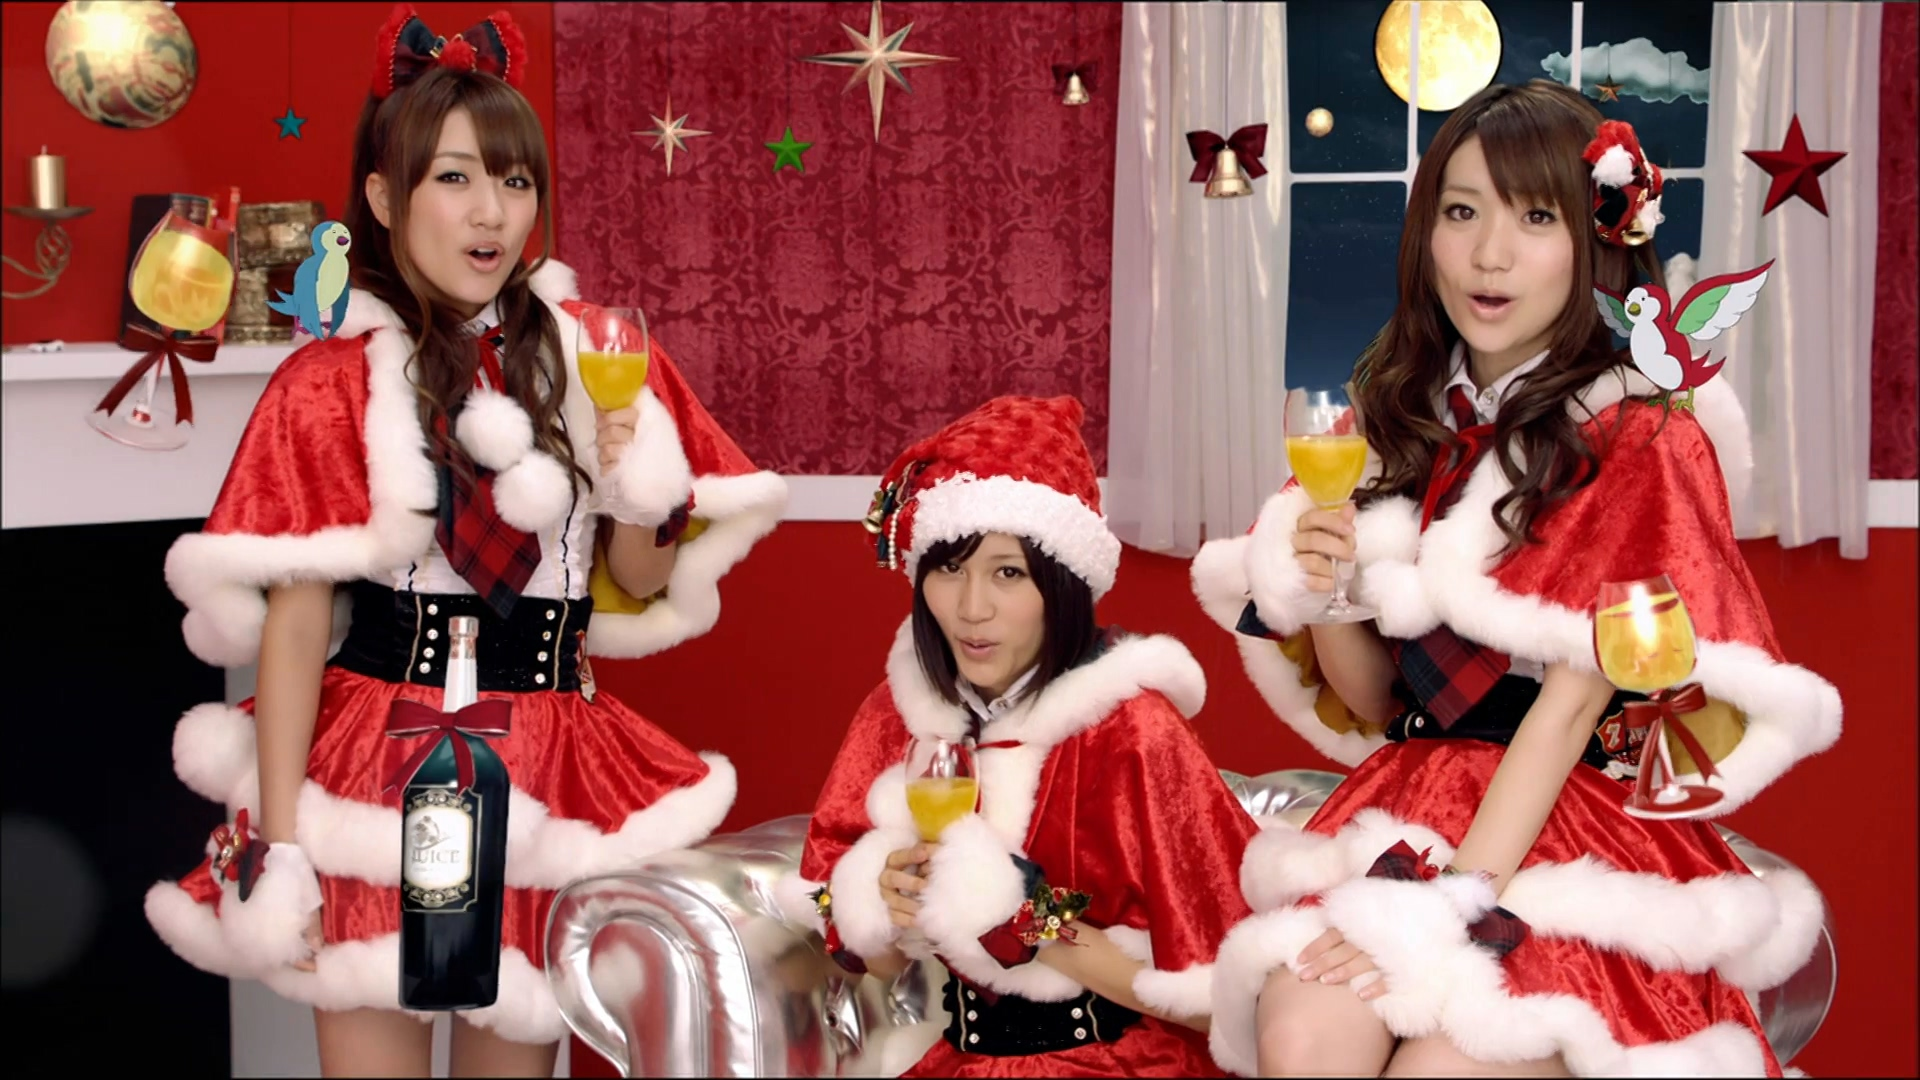 Naisho-Group-Disc-3-Yoyaku-Shita-Christmas-Music-Video-1080p-x264-mp4-20200206-102846-286